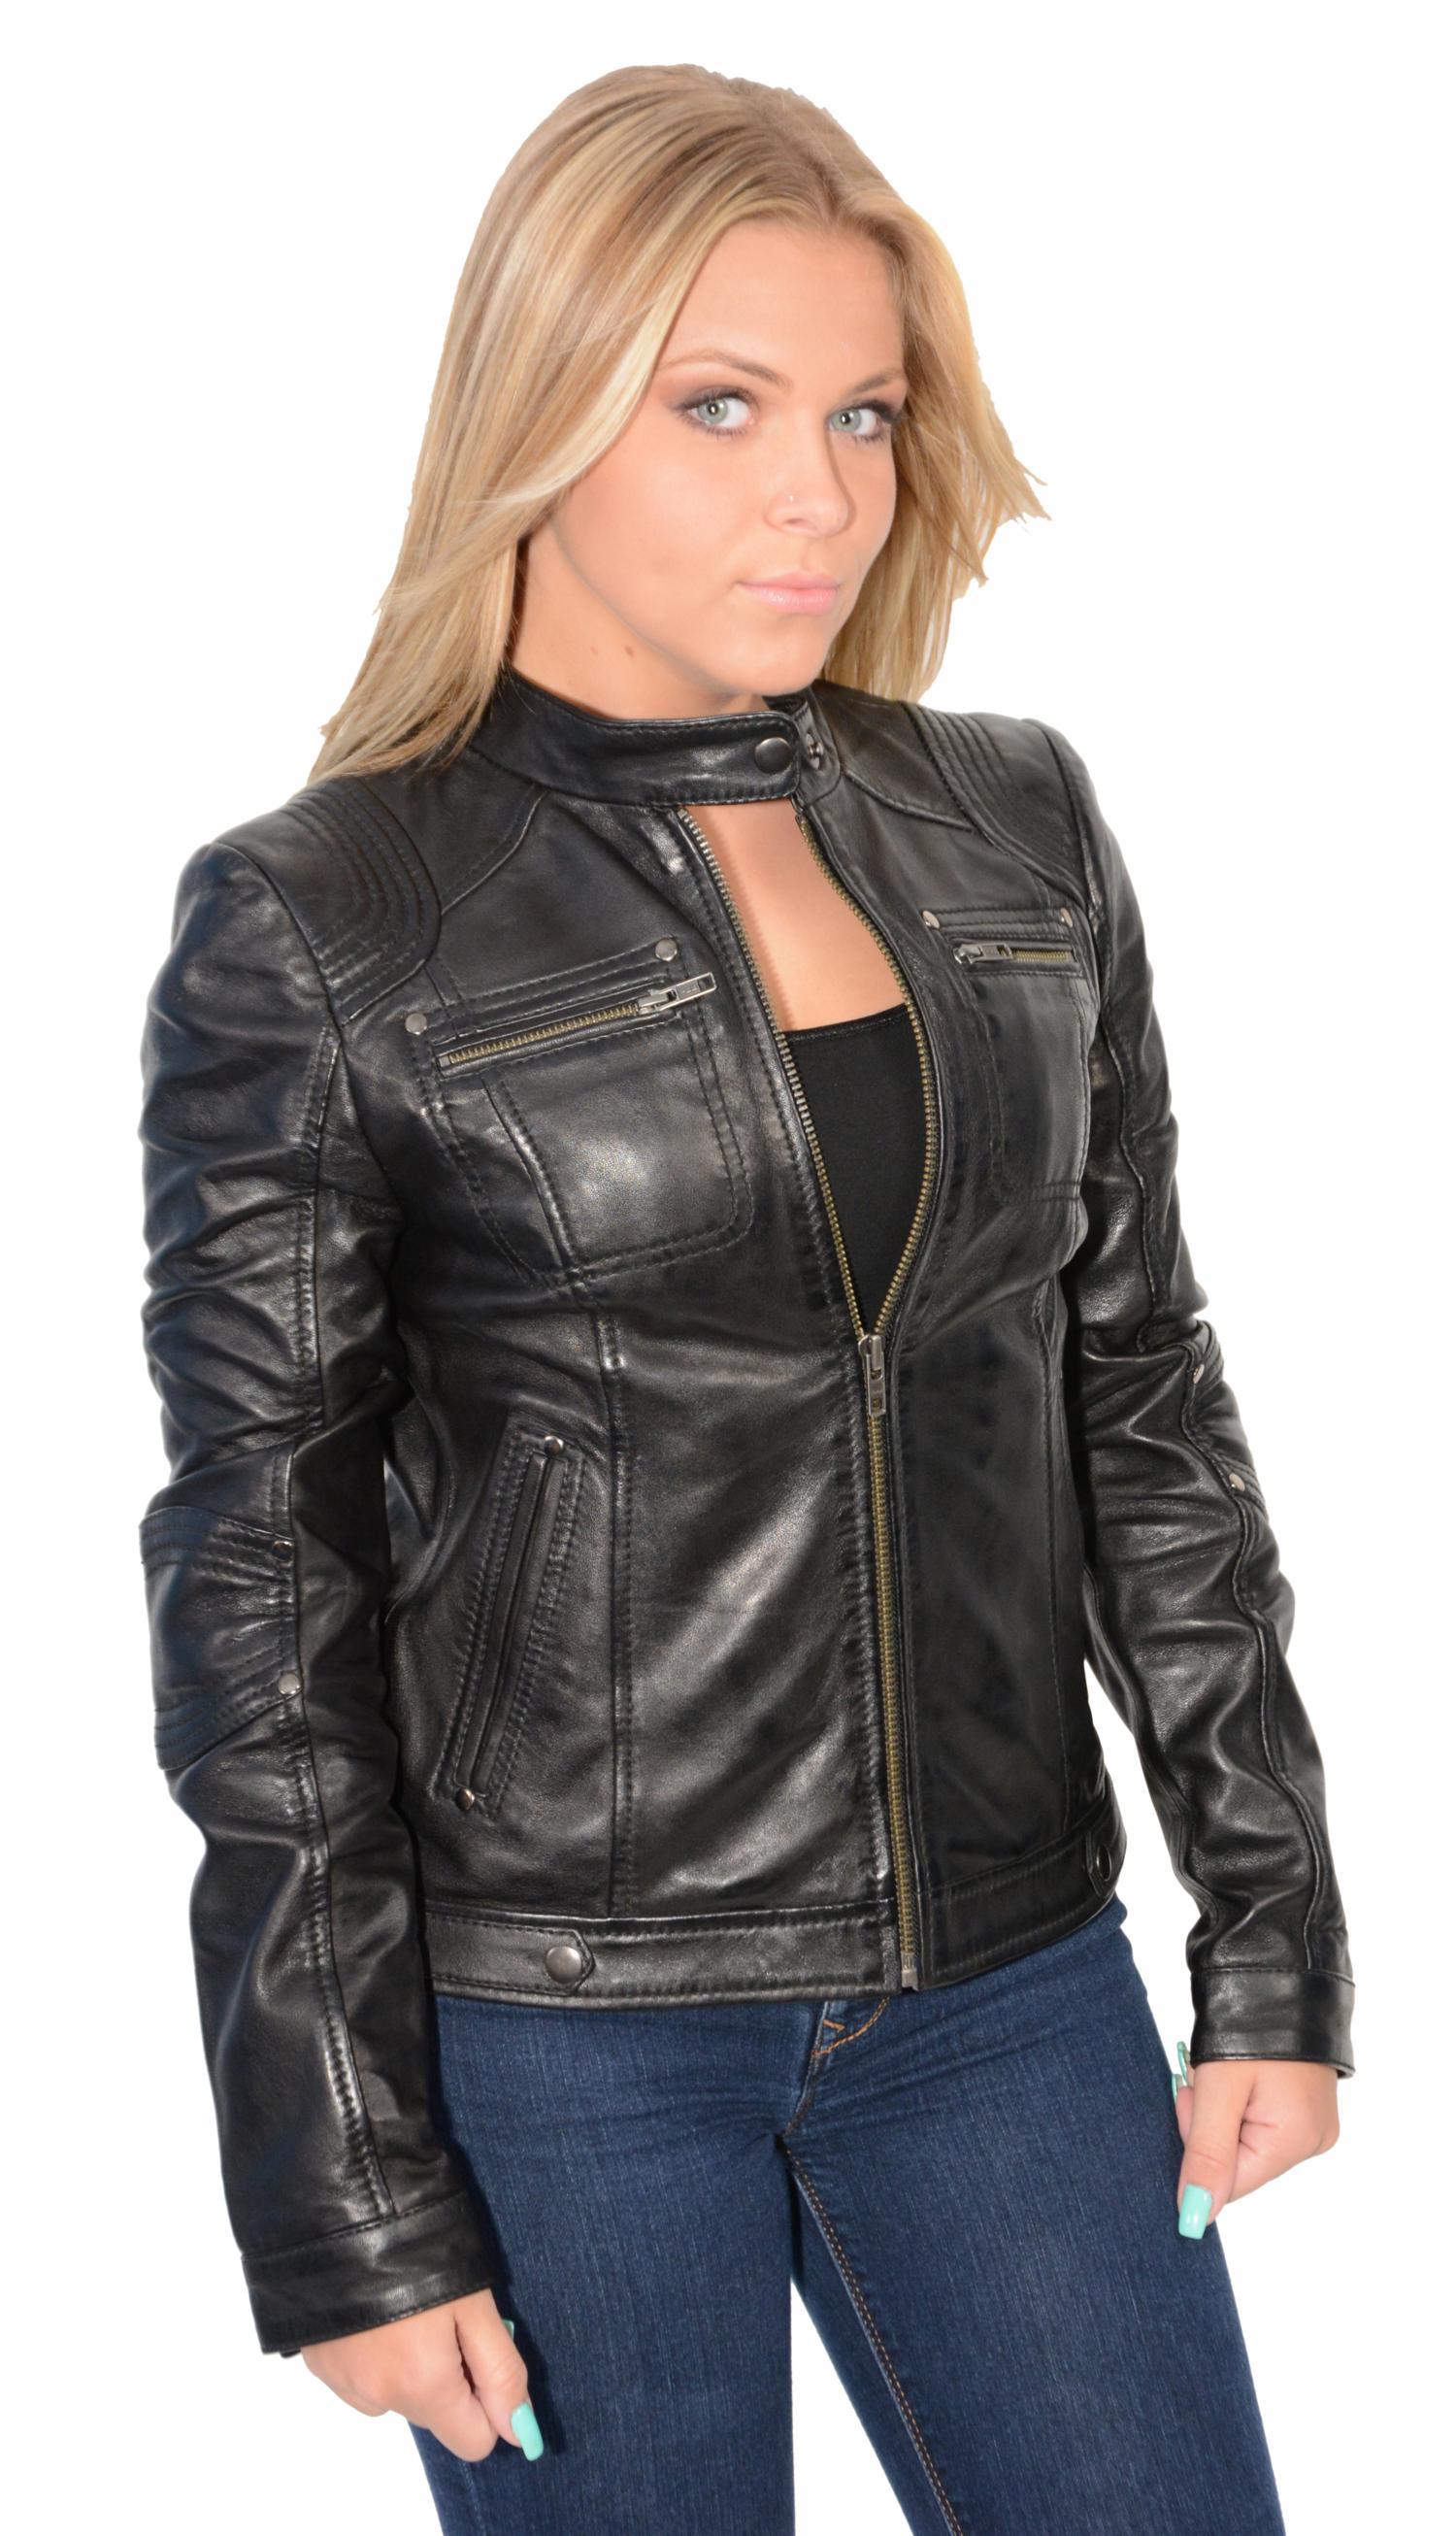 Leather race jacket